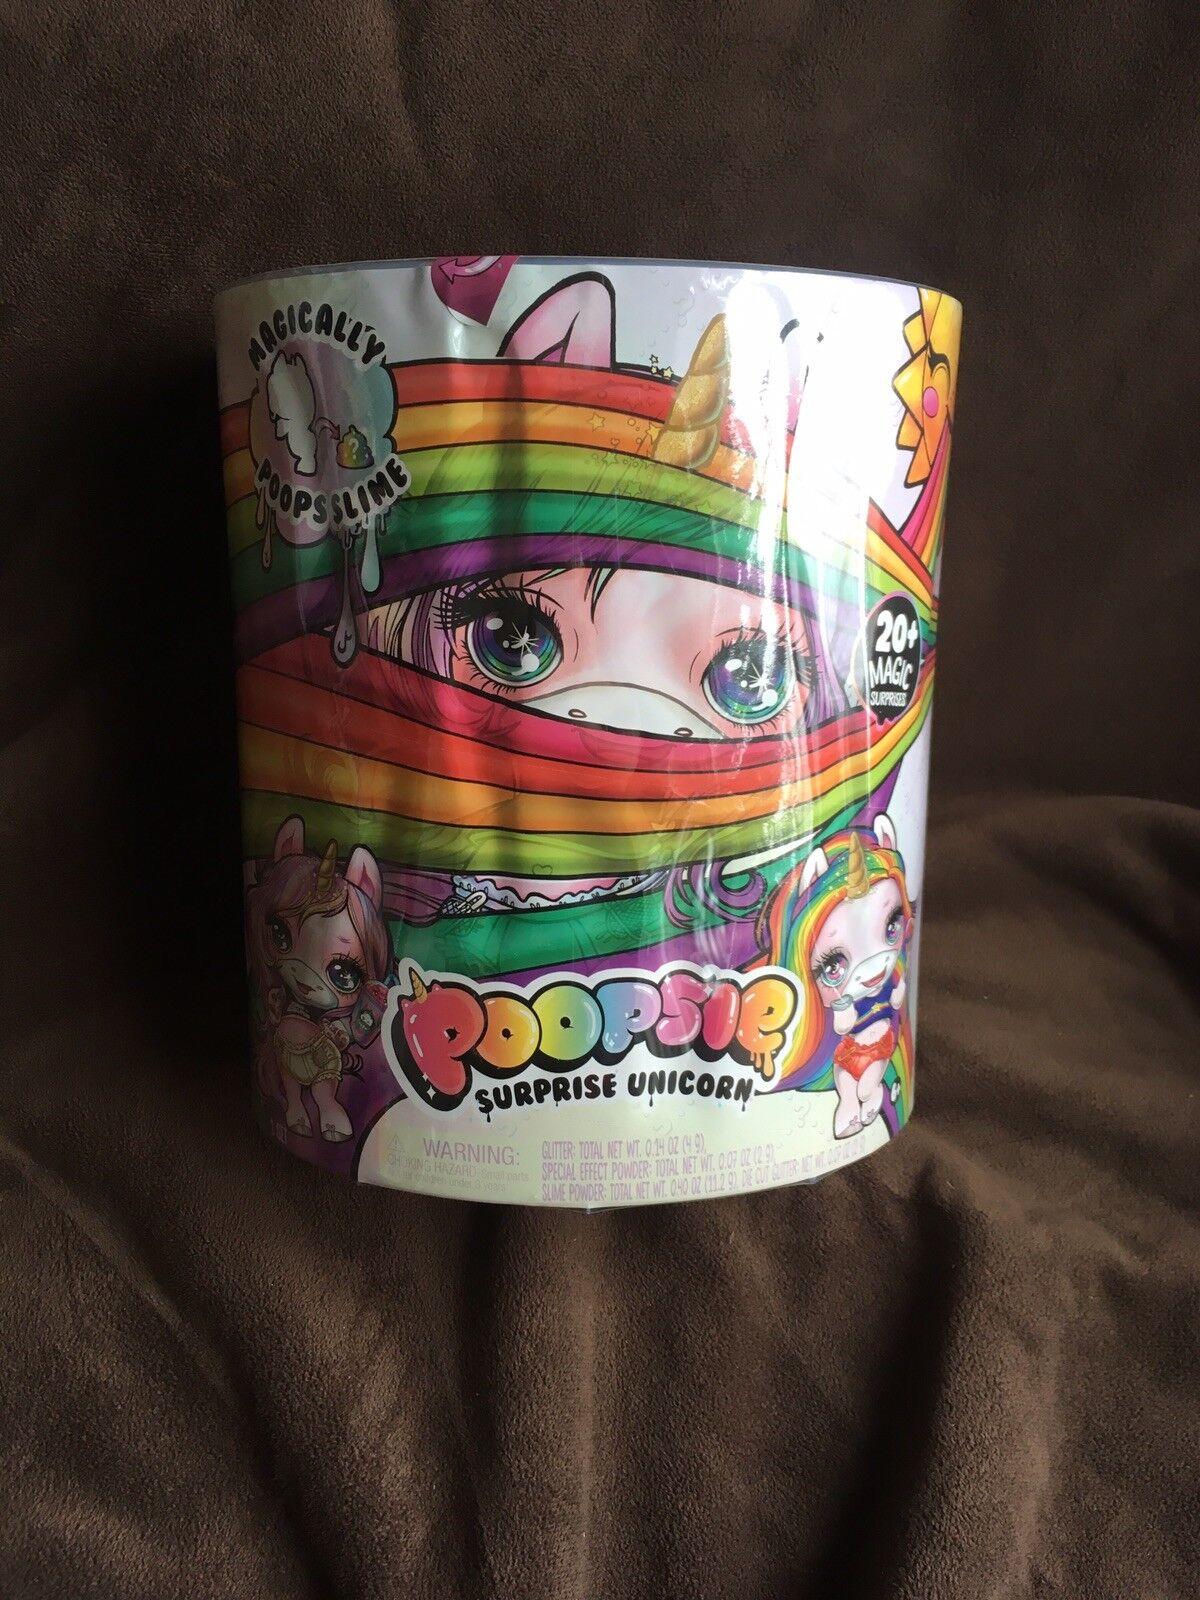 Poopsie Slime Surprise Unicorn Rainbow Brightestrella Or Oopsie estrellalight nuovo